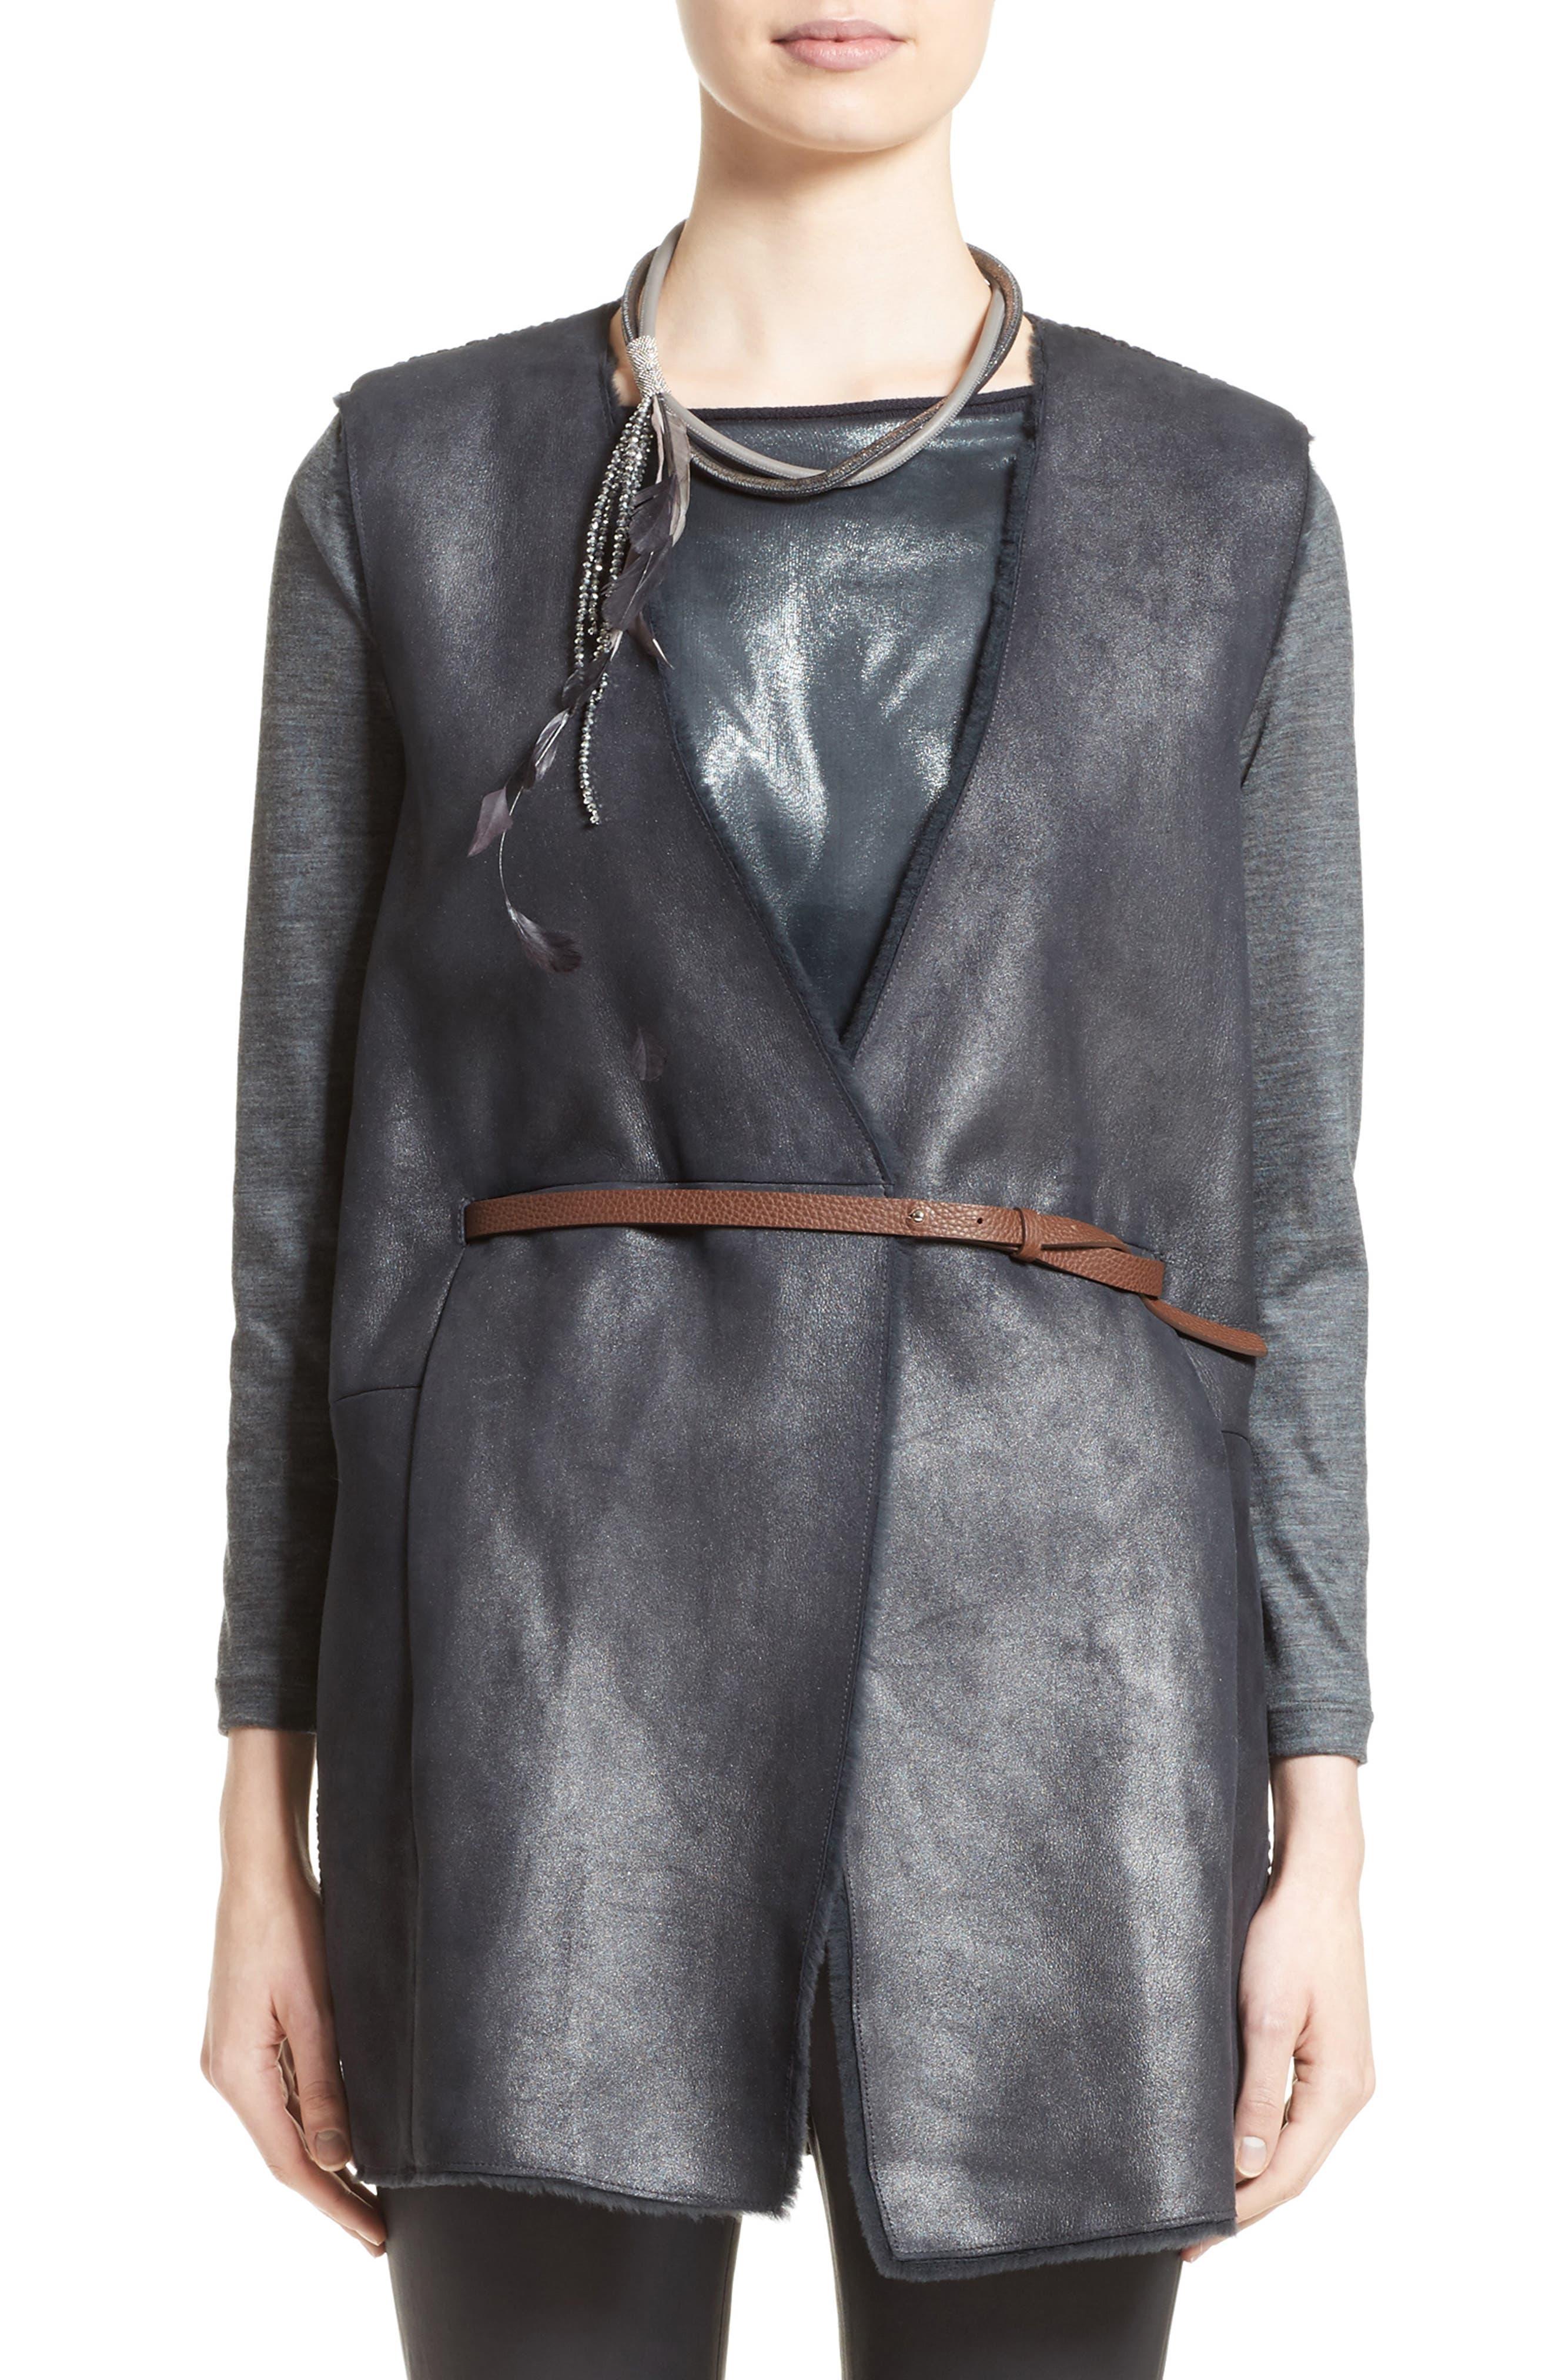 Alternate Image 1 Selected - Fabiana Filippi Genuine Shearling Front Knit Vest